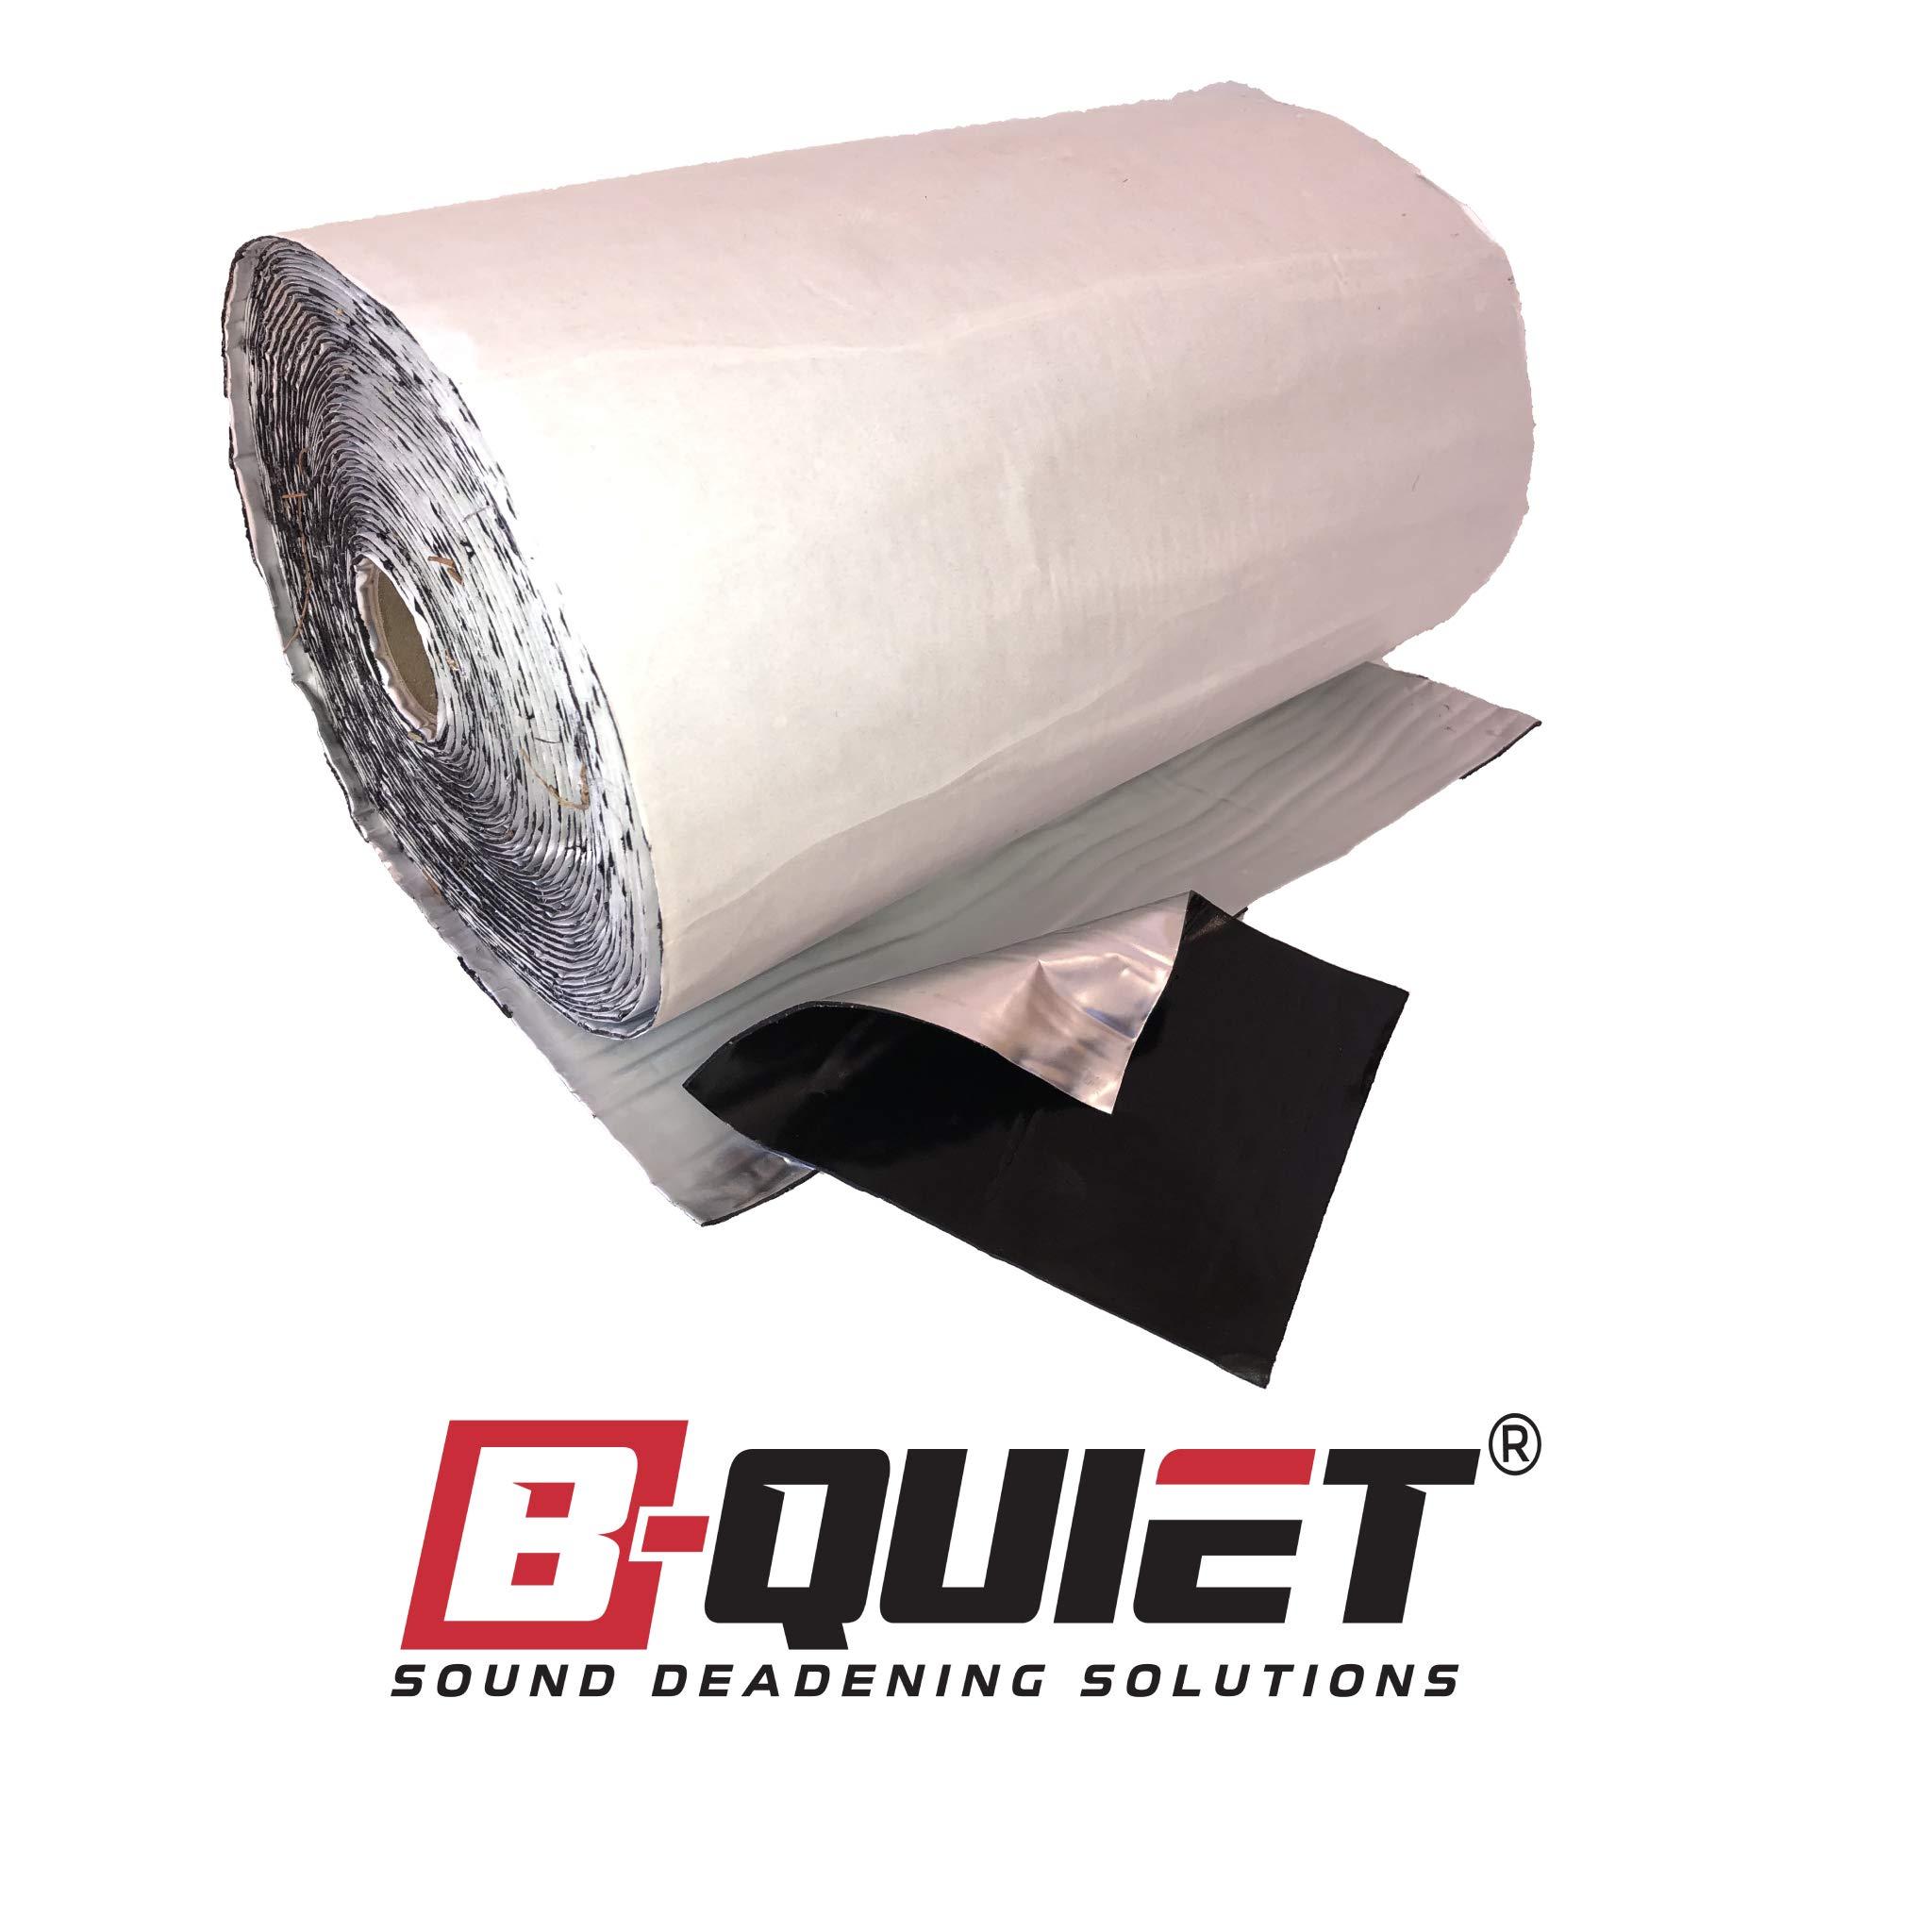 B-Quiet Ultimate The Best Viscoelastic Sound Deadener 12 Sq. Ft. Sound Deadening Sound Deampening Mat Car Sound Dampening Material Bulk Kit Trunk Hood Door Mats …